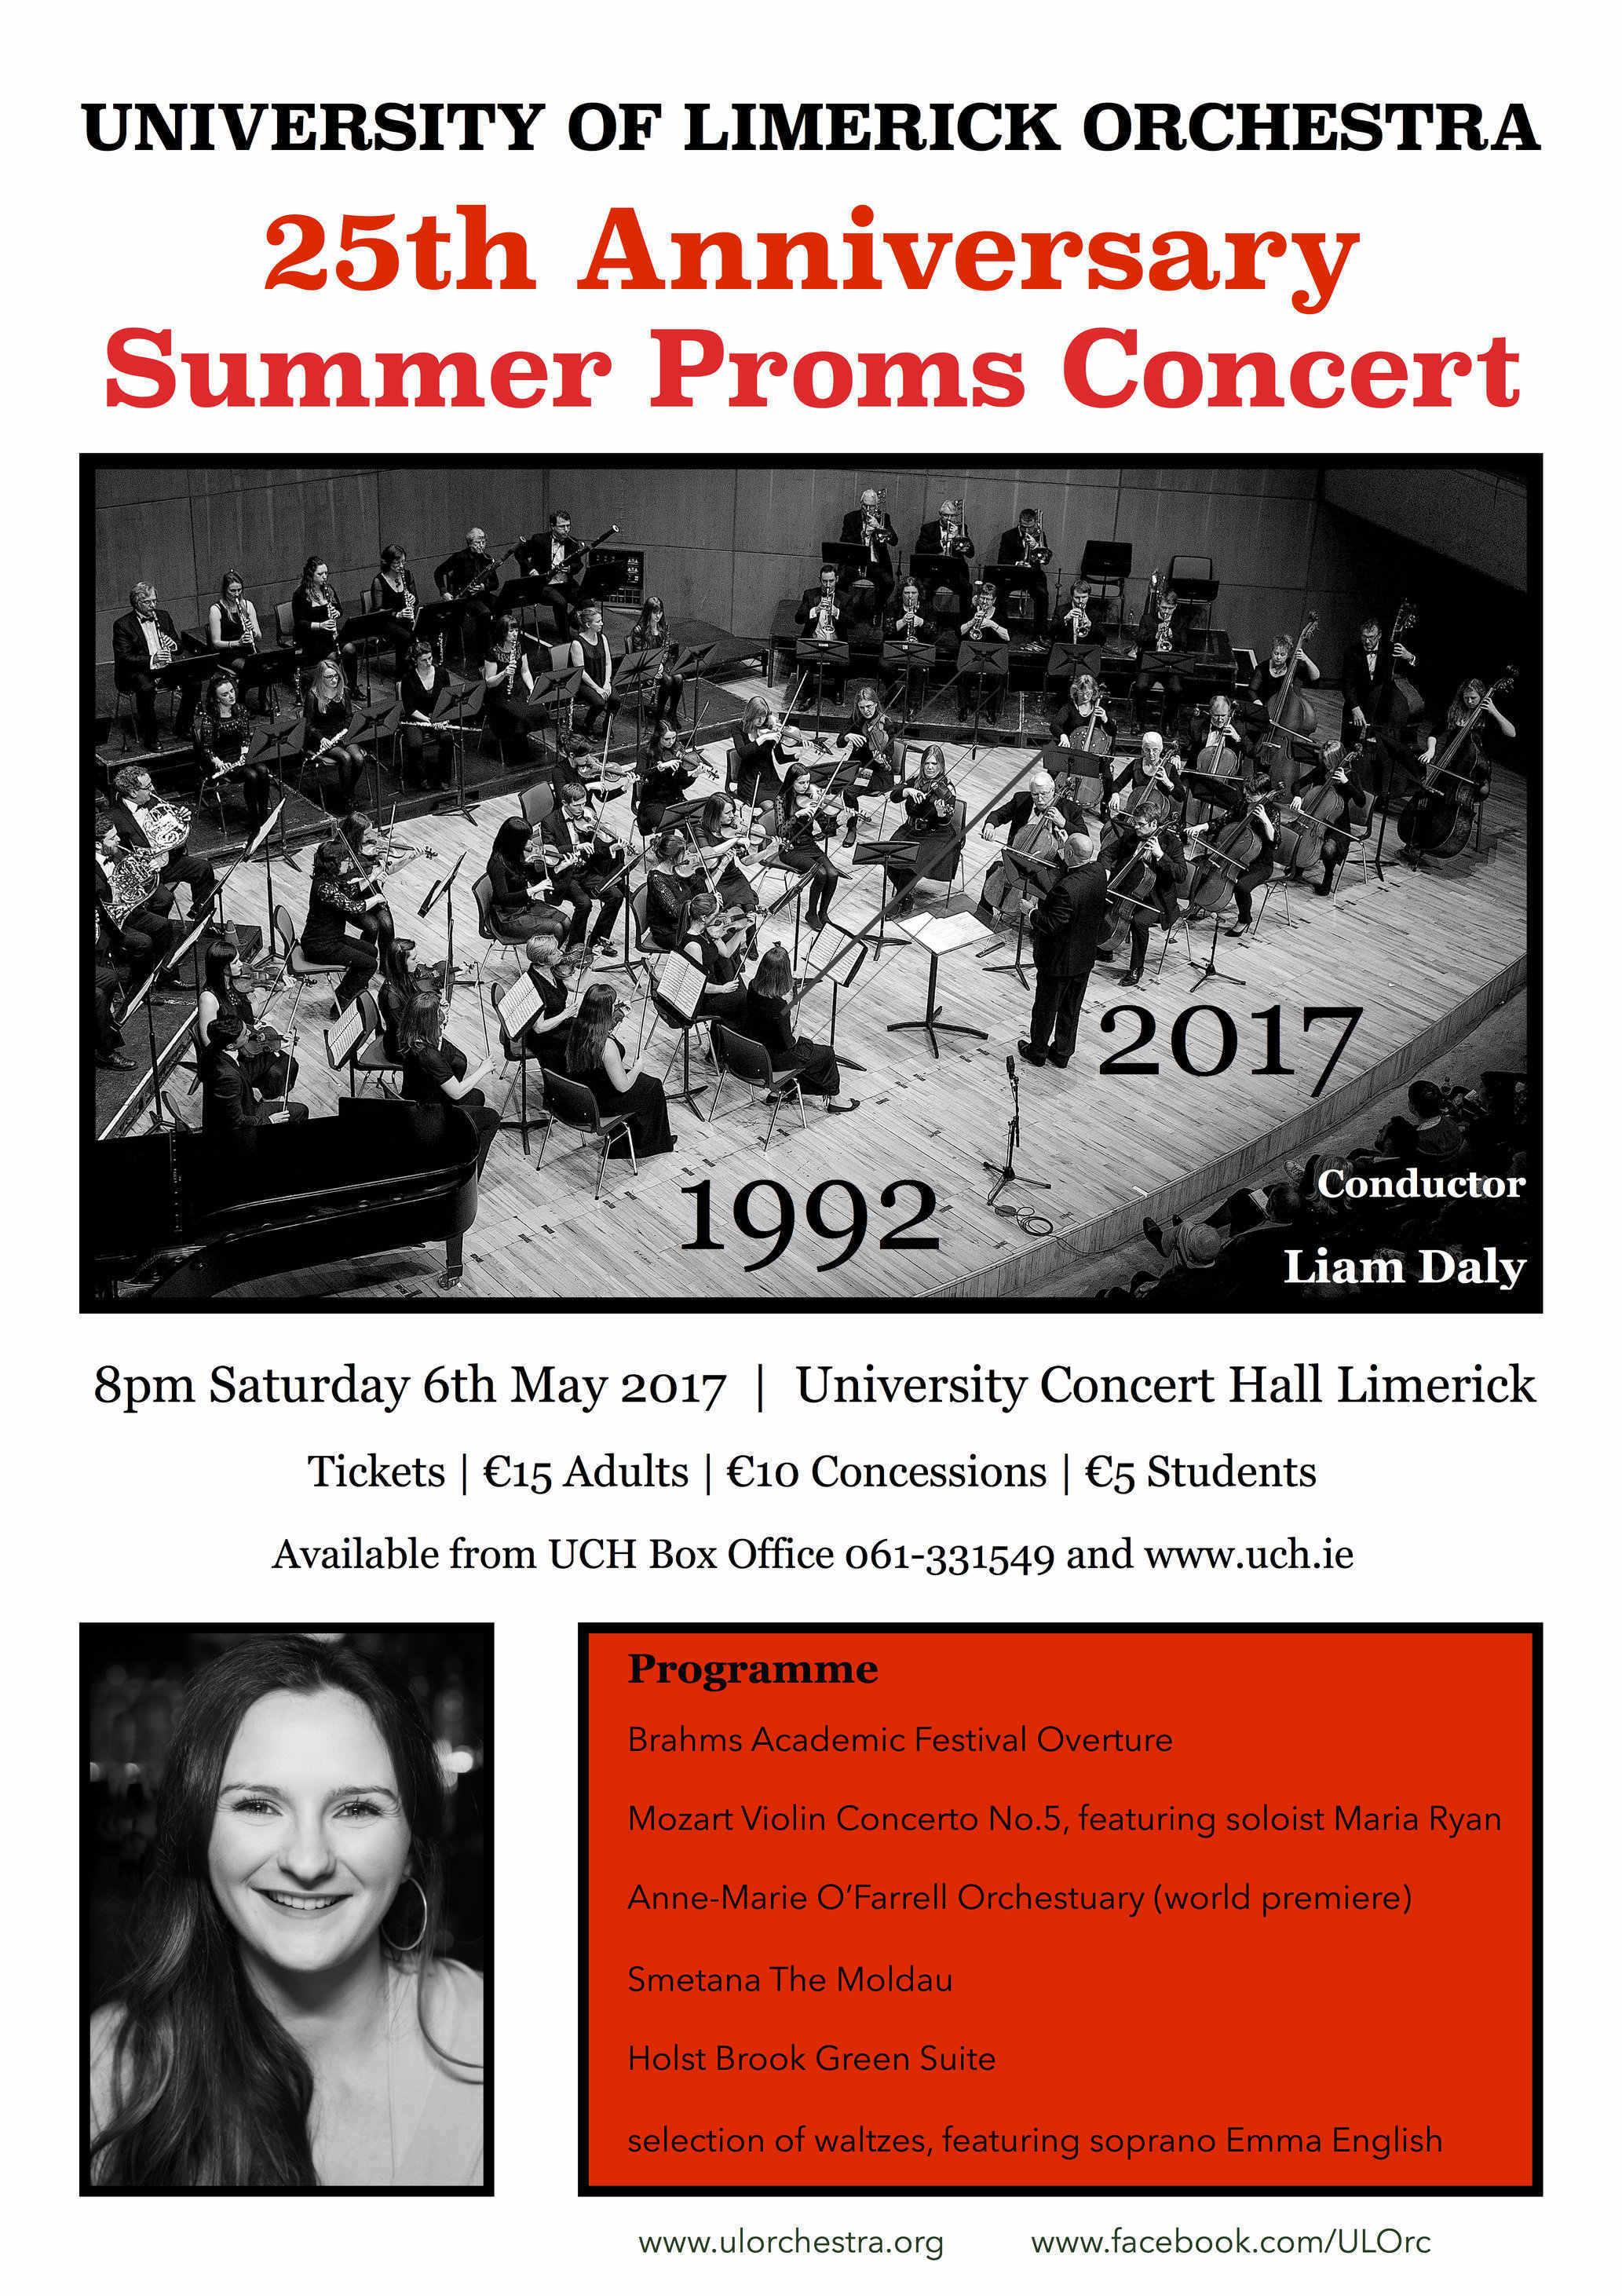 Summer Proms Concert